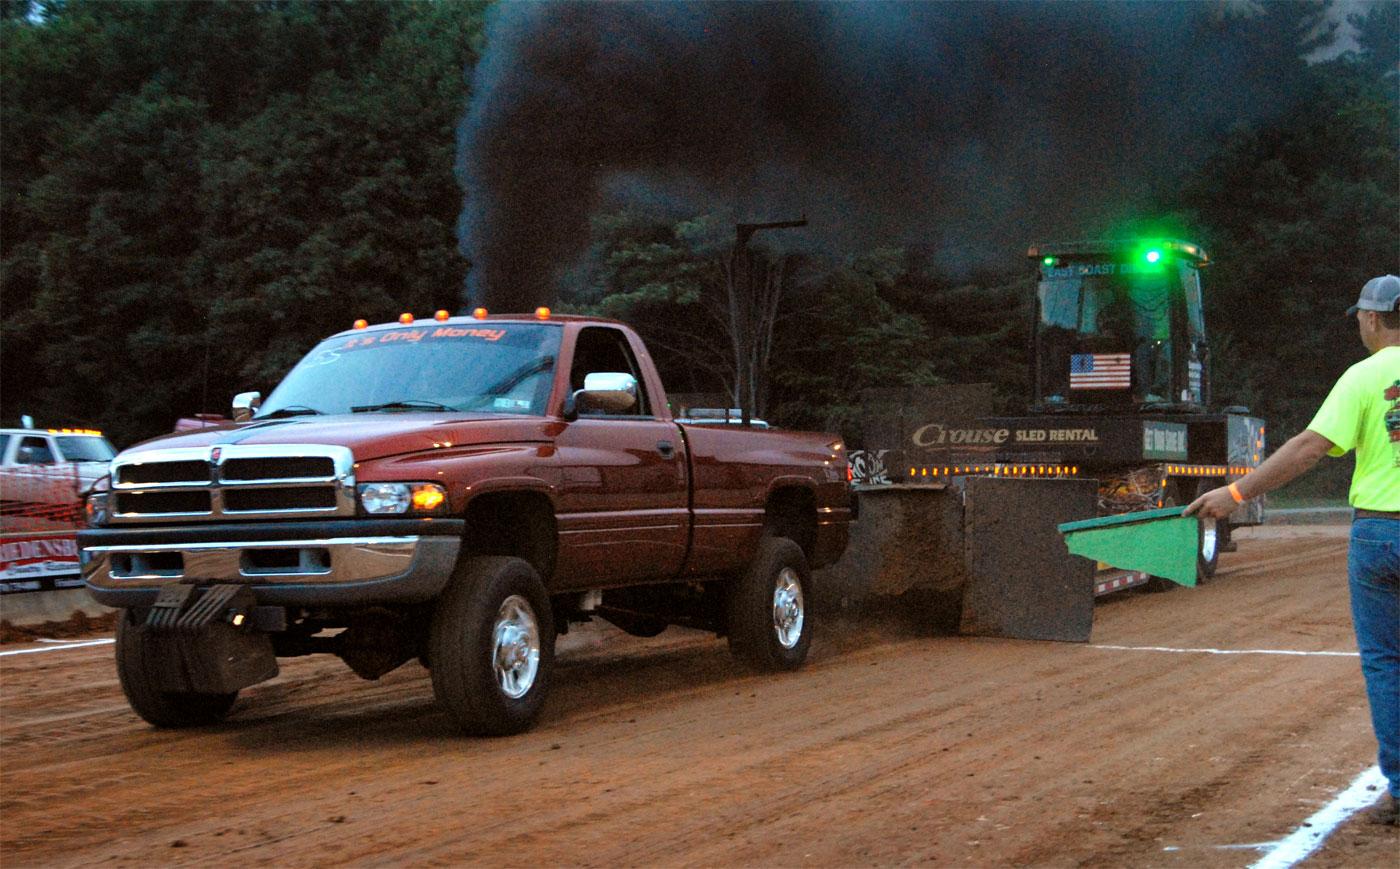 Roar of the Engines – Schuylkill County Fair